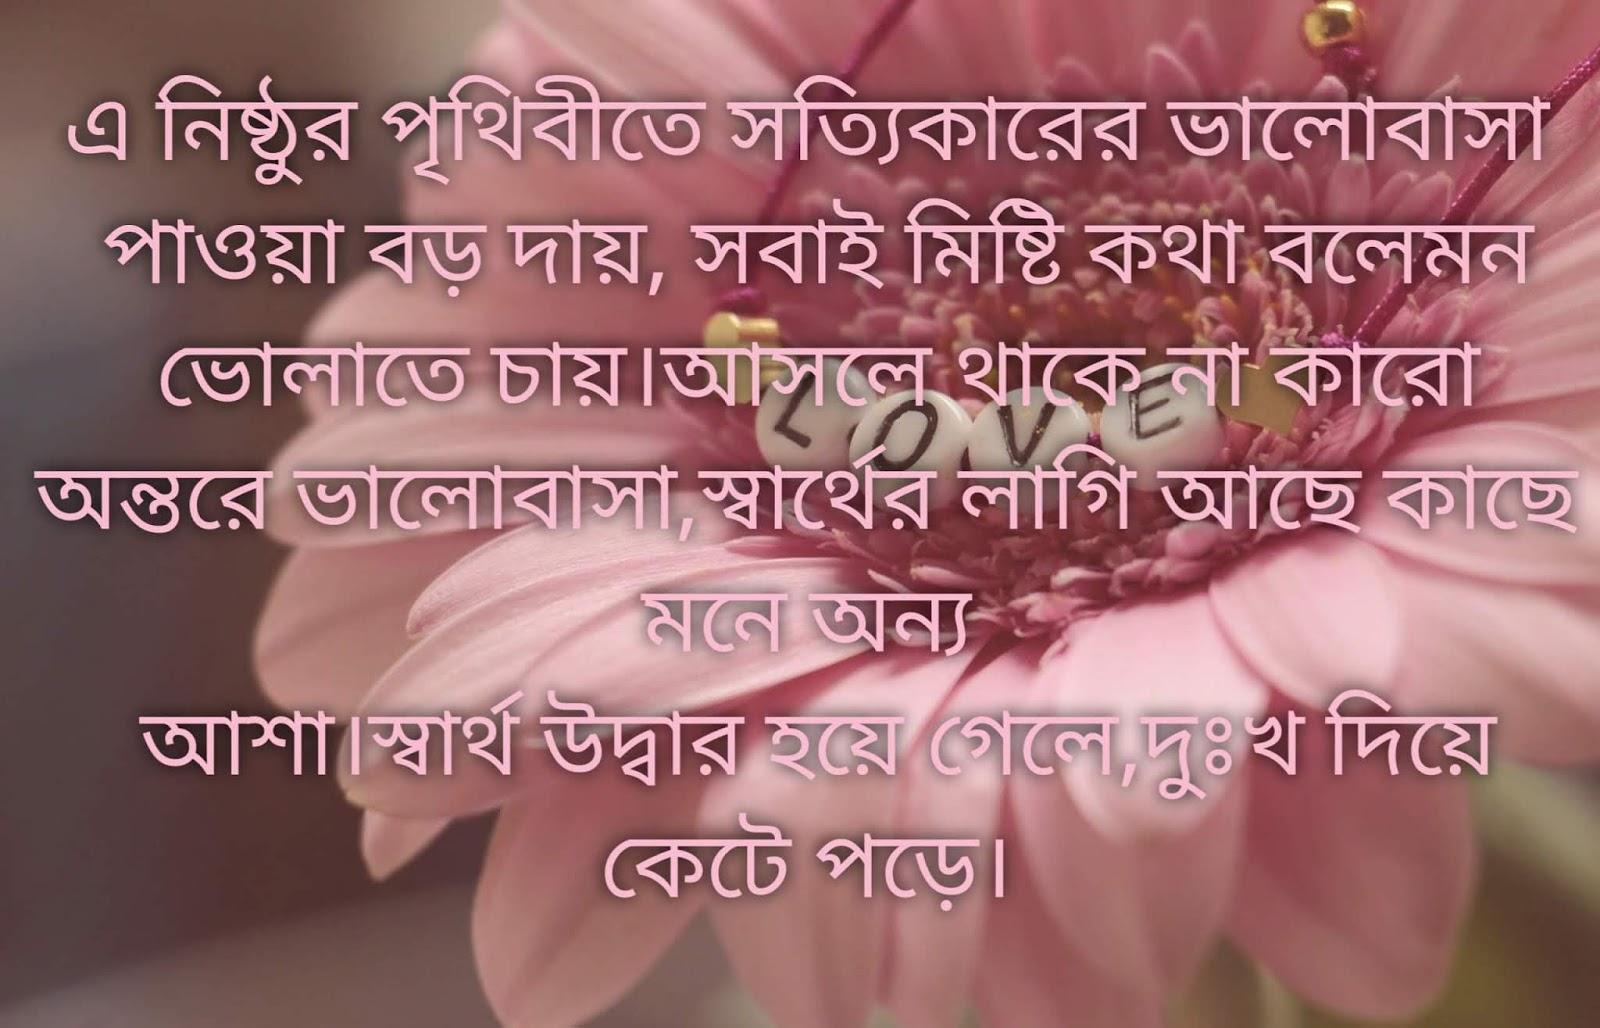 Bengali Shayari image download